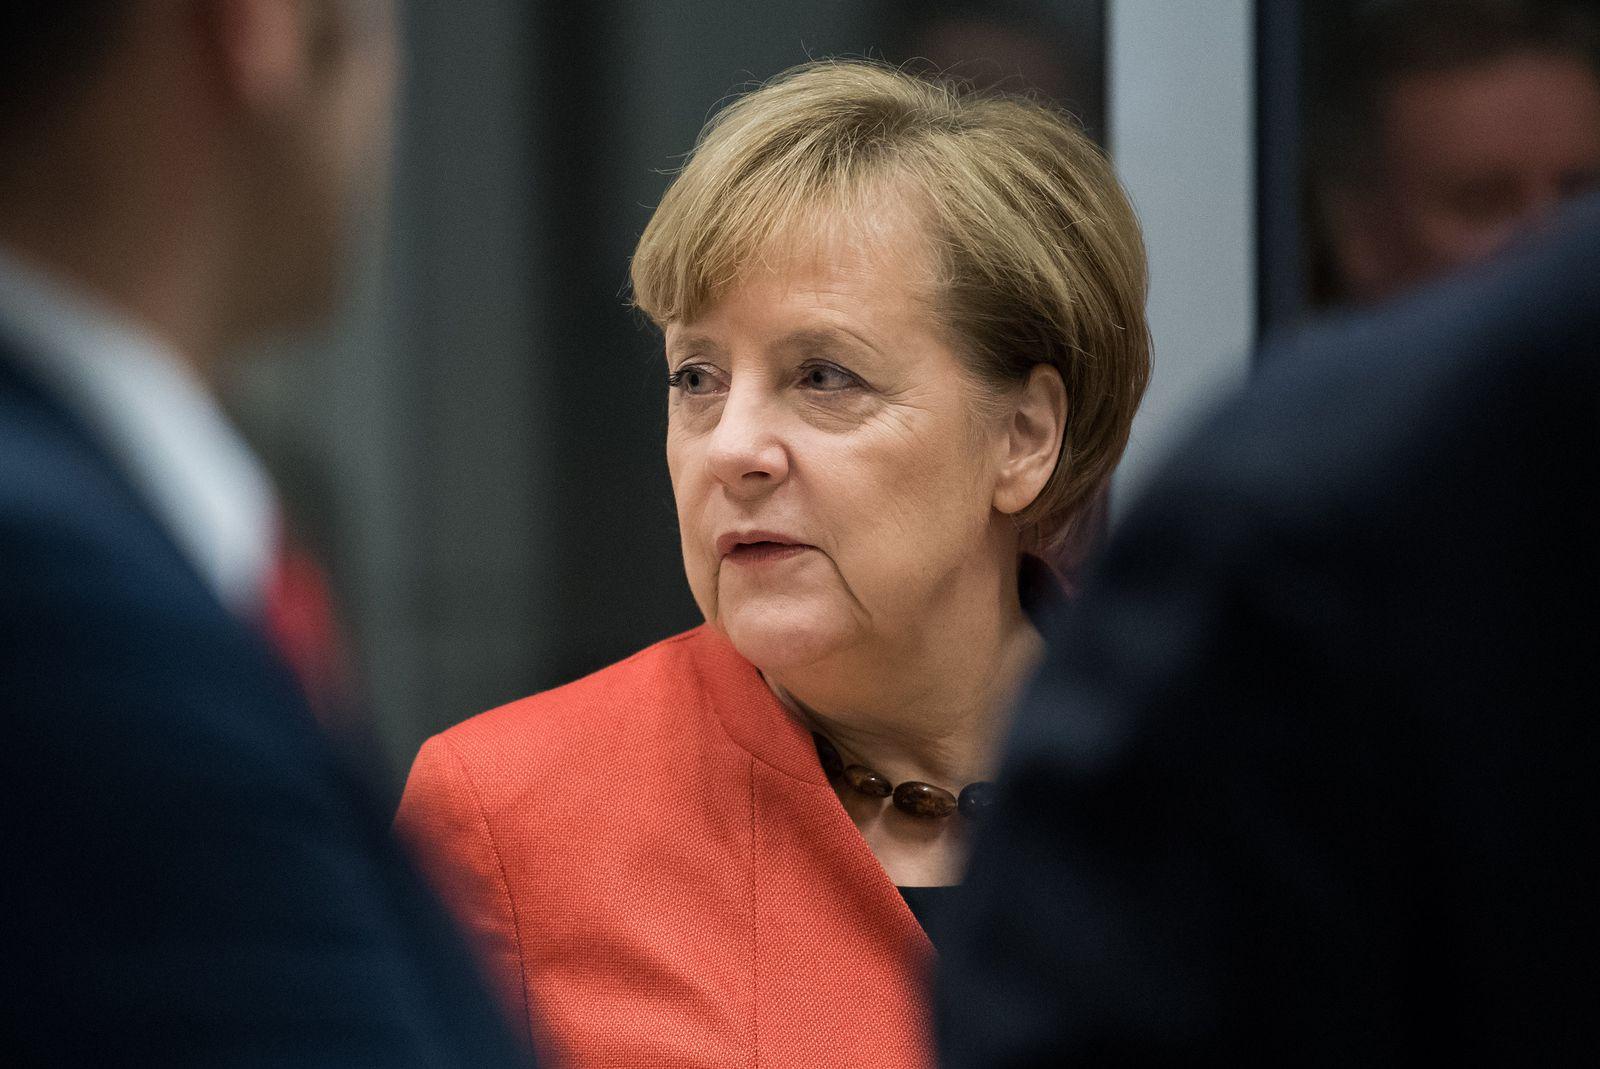 CDU/ Merkel